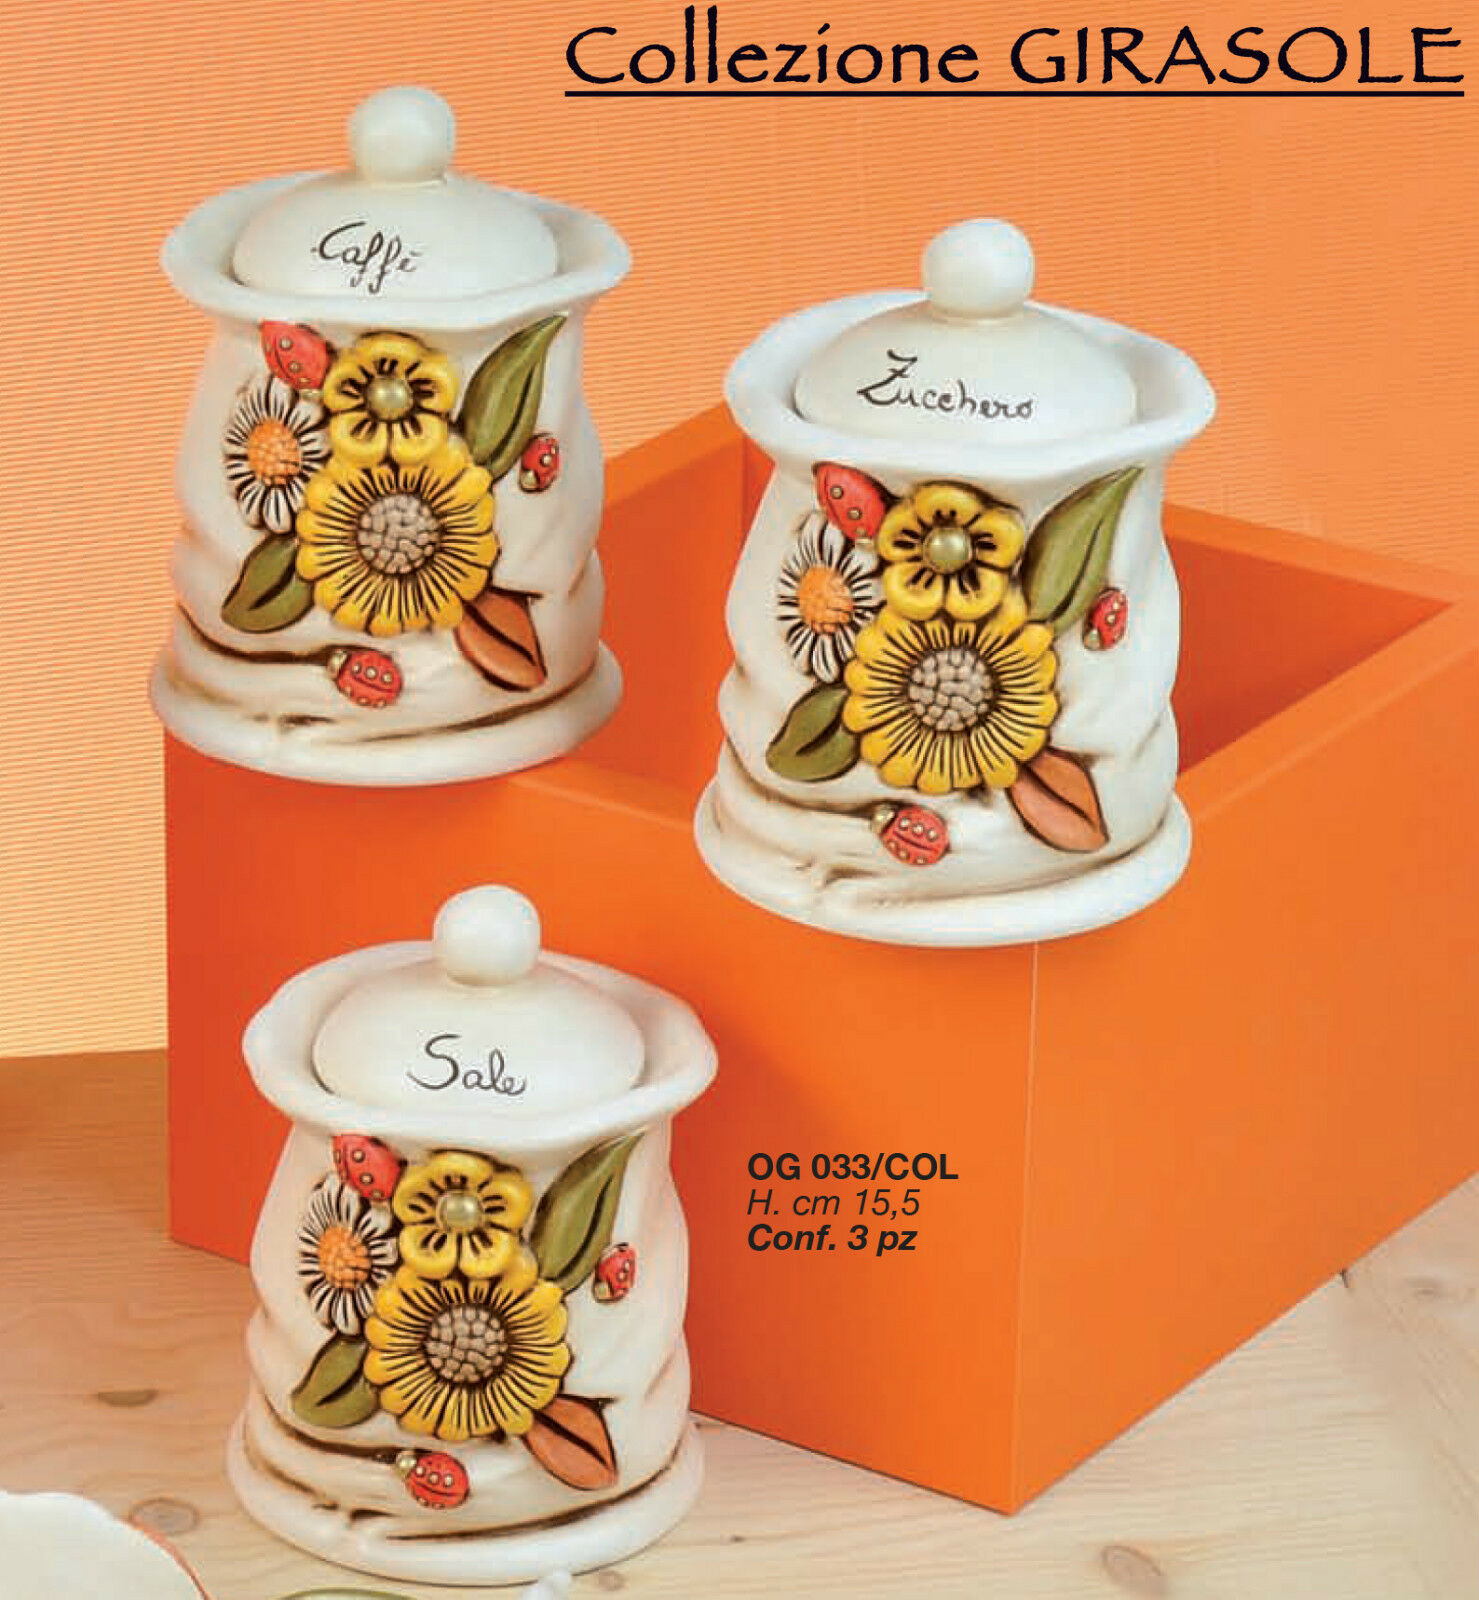 Tris Barattoli sale, zucchero, caffè in ceramica di Capodimonte dipinti a mano